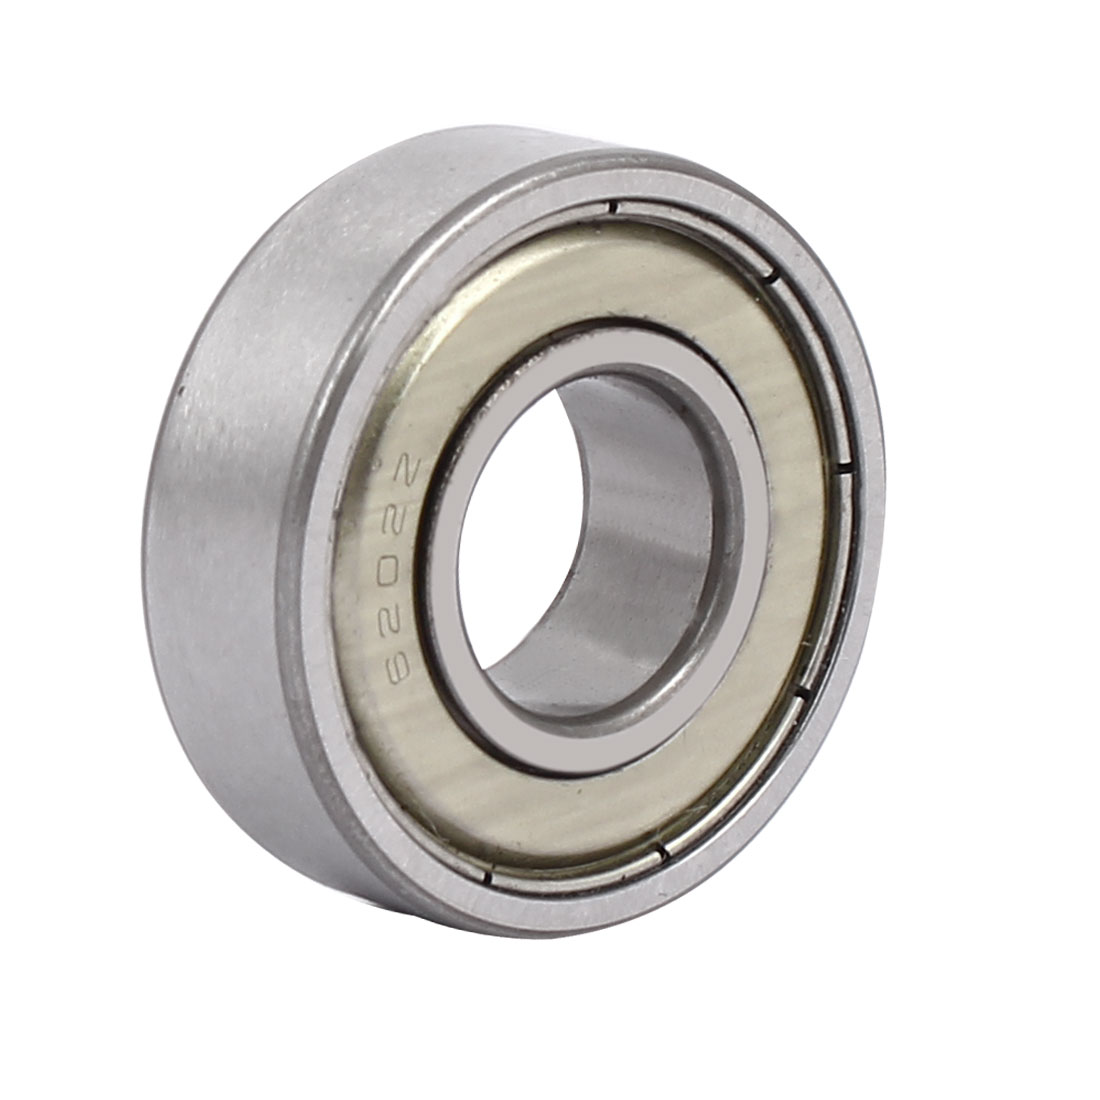 6202Z Double Shielded Deep Groove Ball Bearing 35mmx15mmx11mm